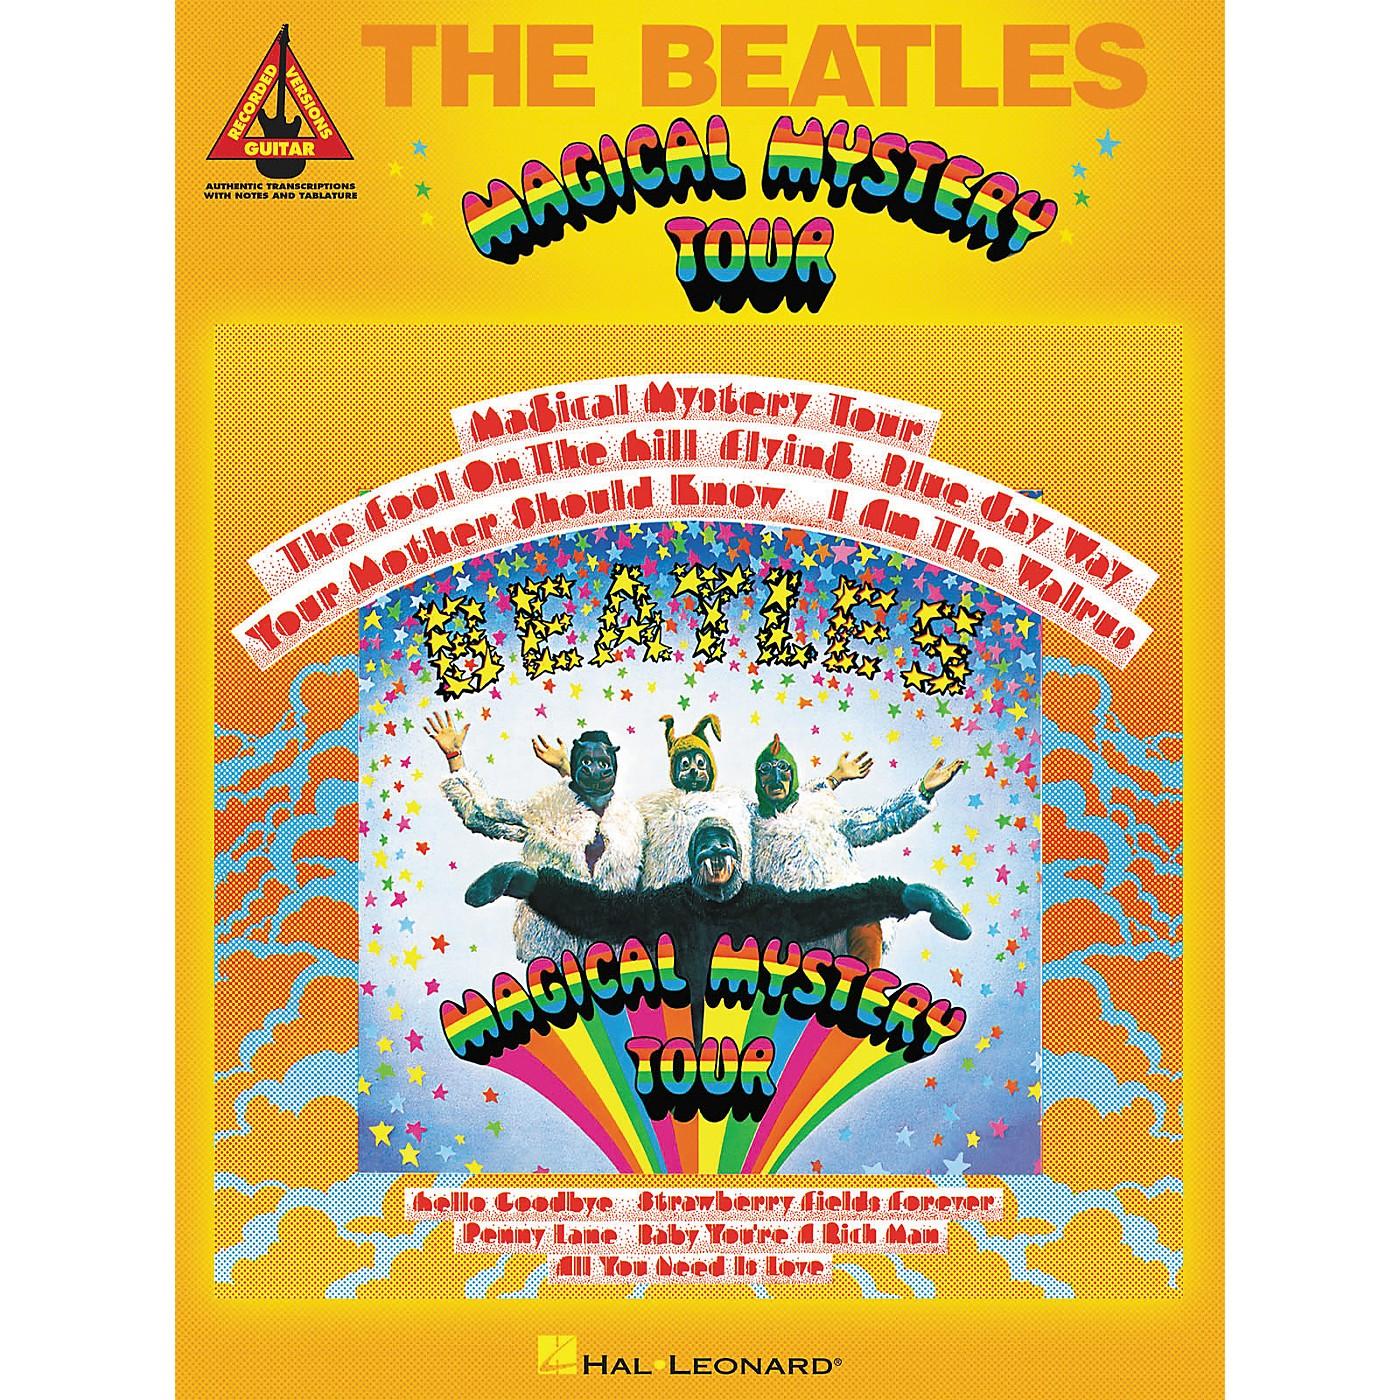 Hal Leonard The Beatles - Magical Mystery Tour Guitar Tab Songbook thumbnail